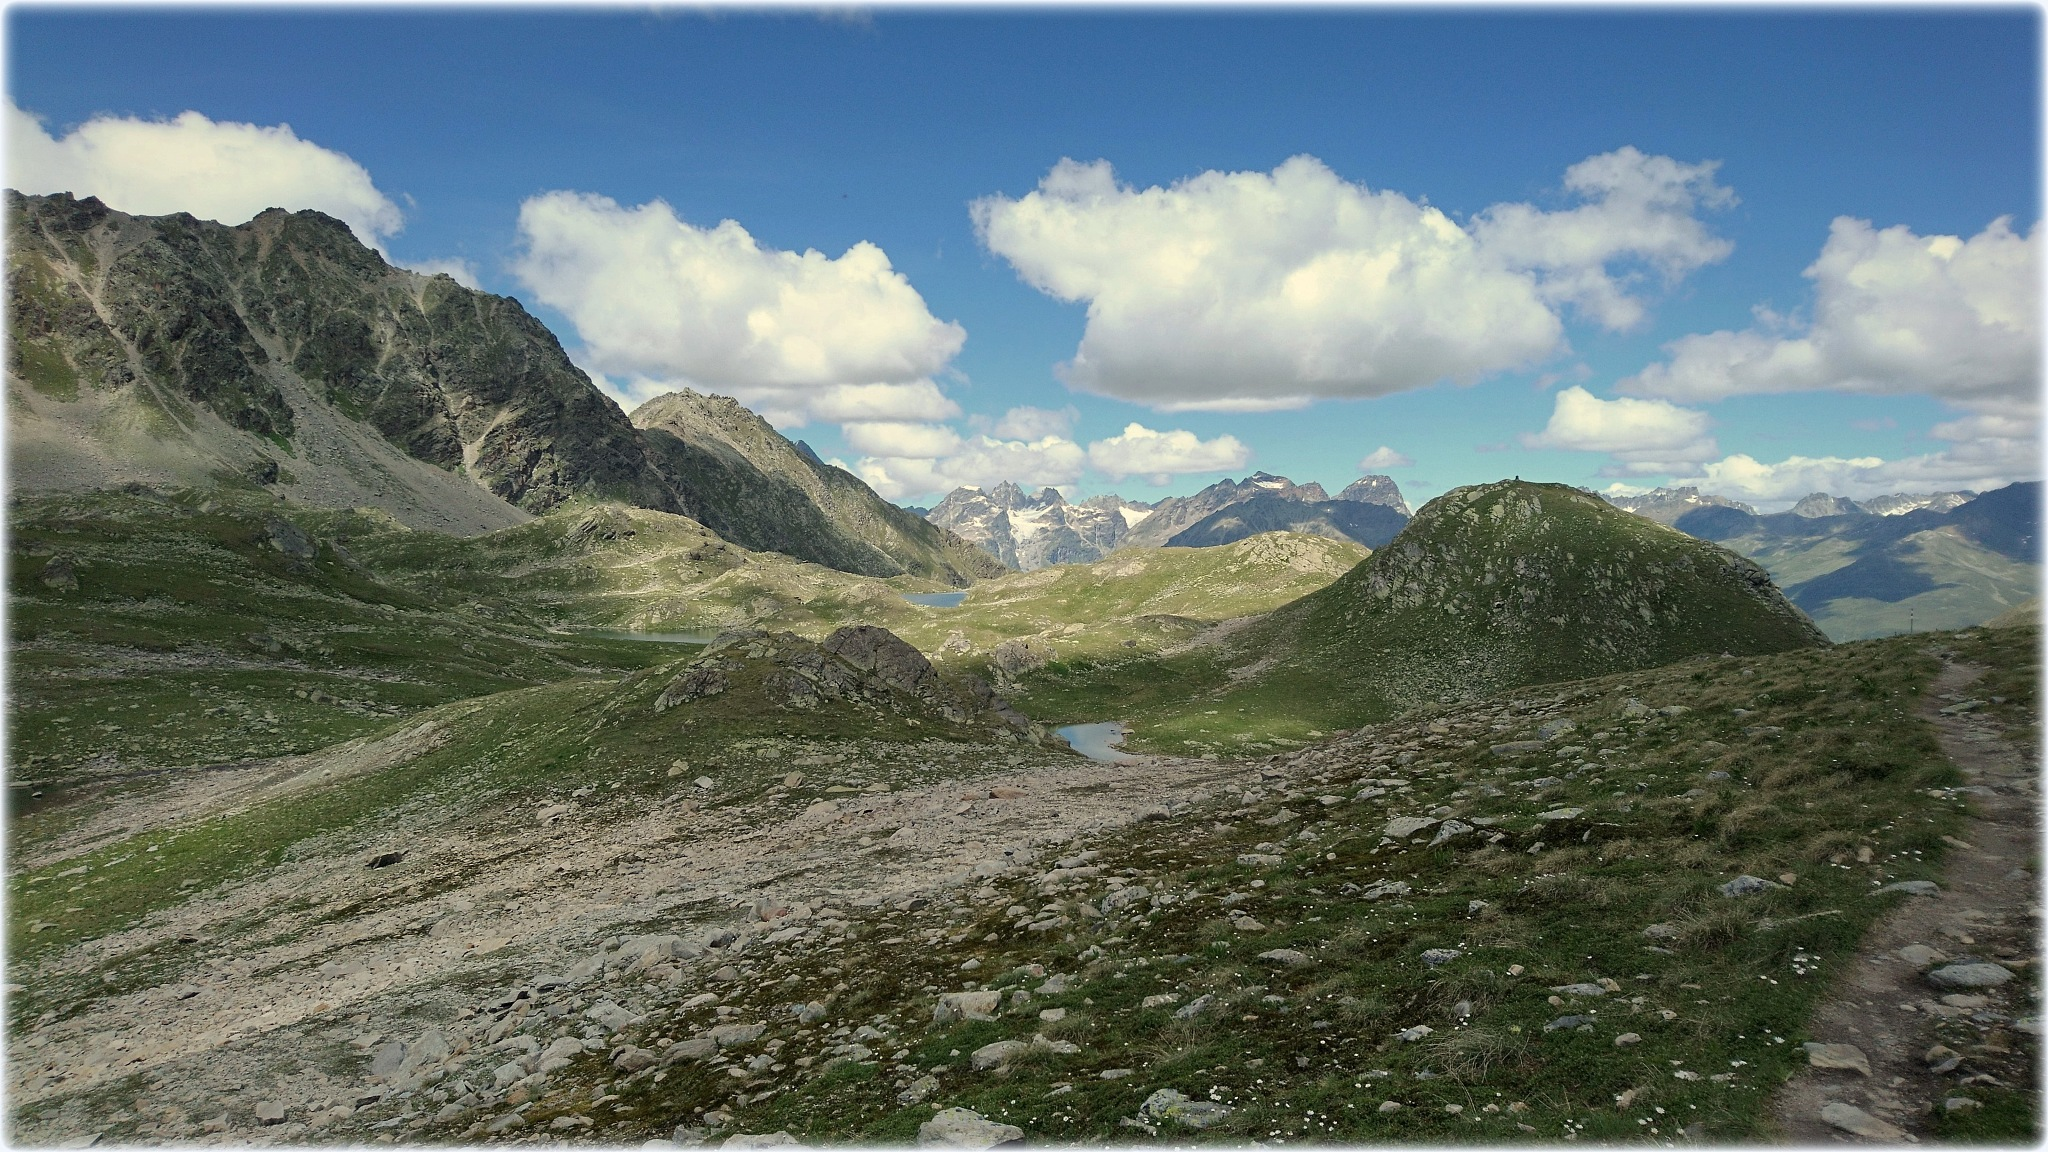 """macun;parc national;"" by BauerStefan"